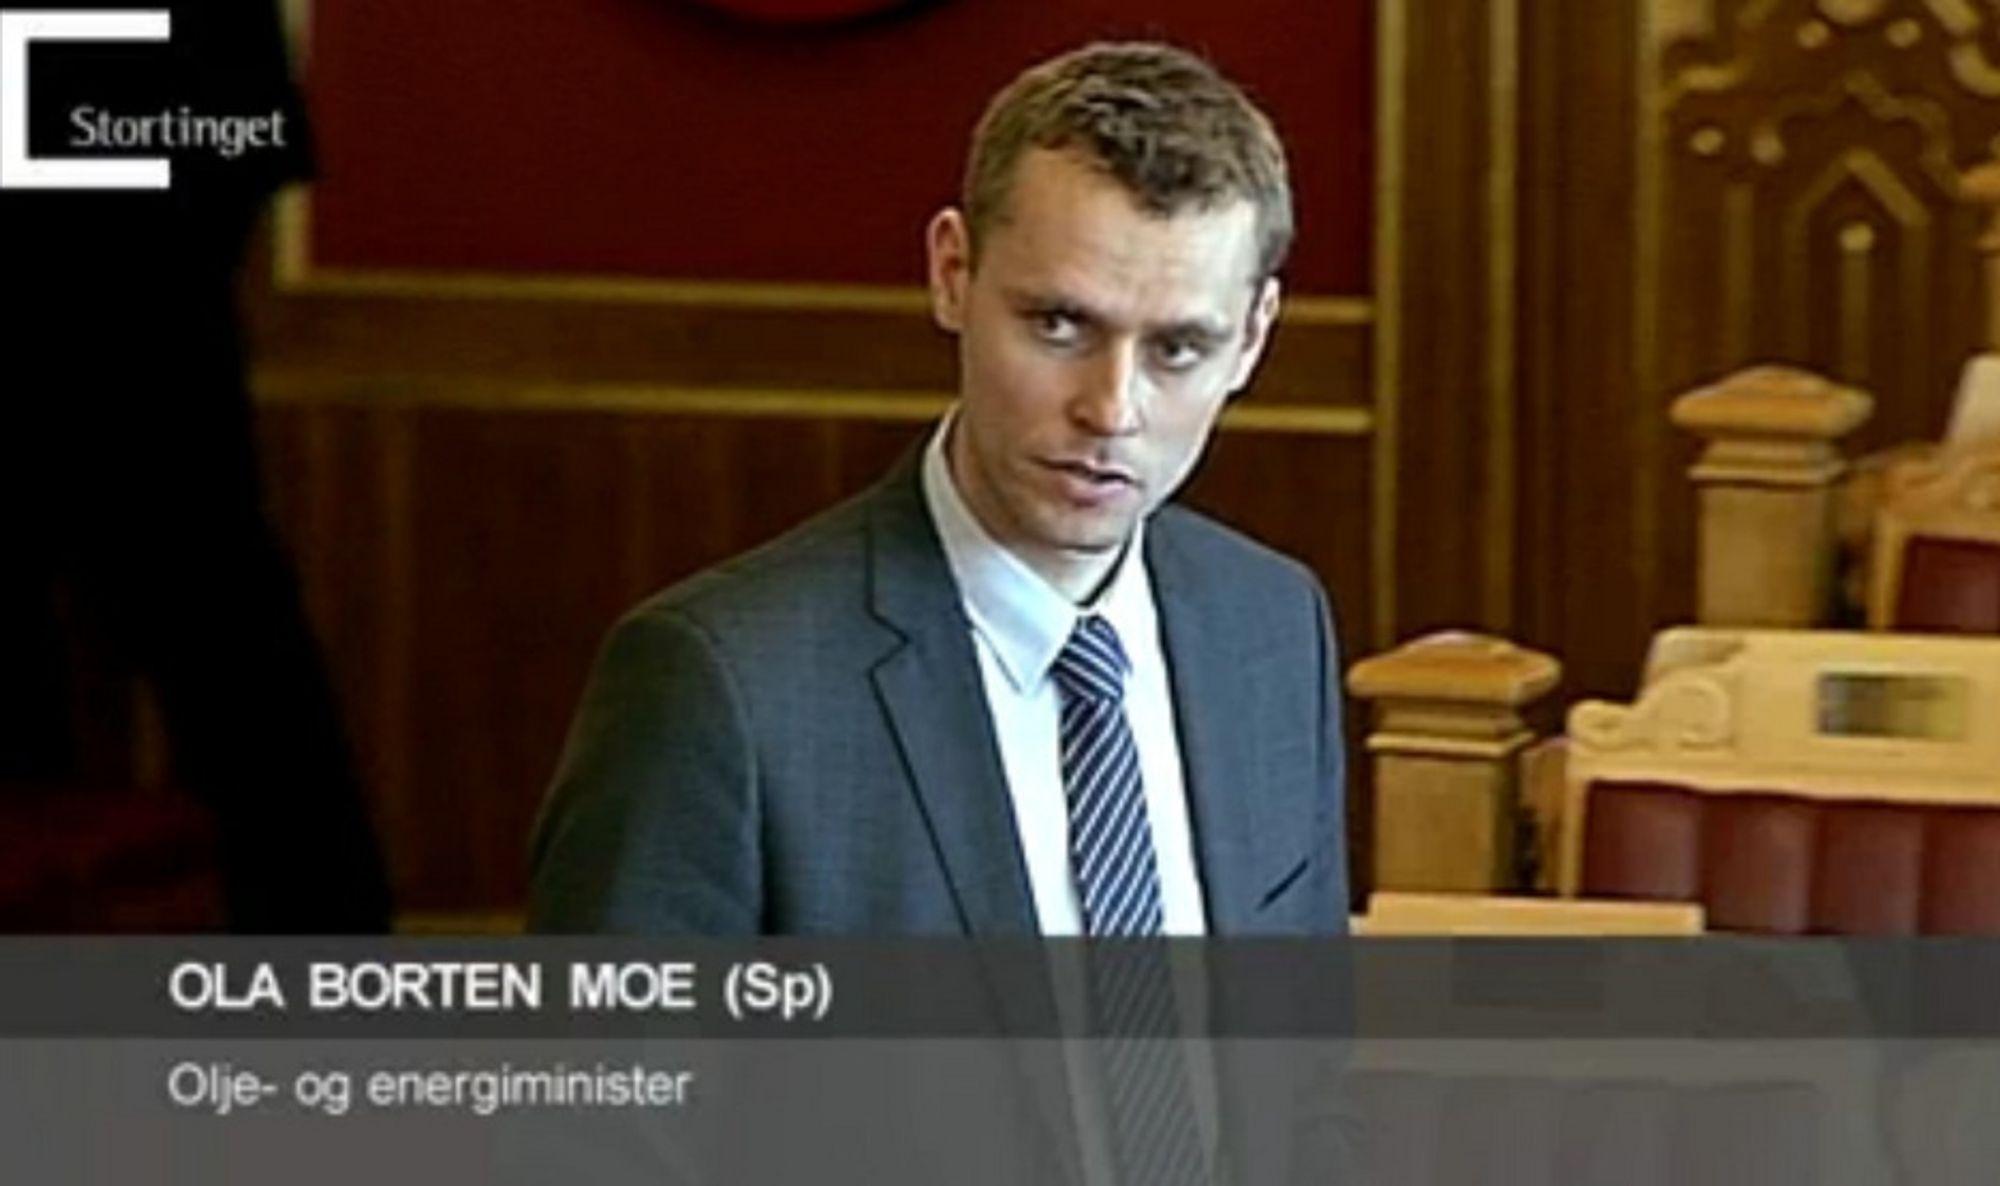 ØNSKER FORENKLING: Energiminister Ola Borten Moe (Sp) ønsker at beslutninger skal fattes på så lavt nivå som mulig.